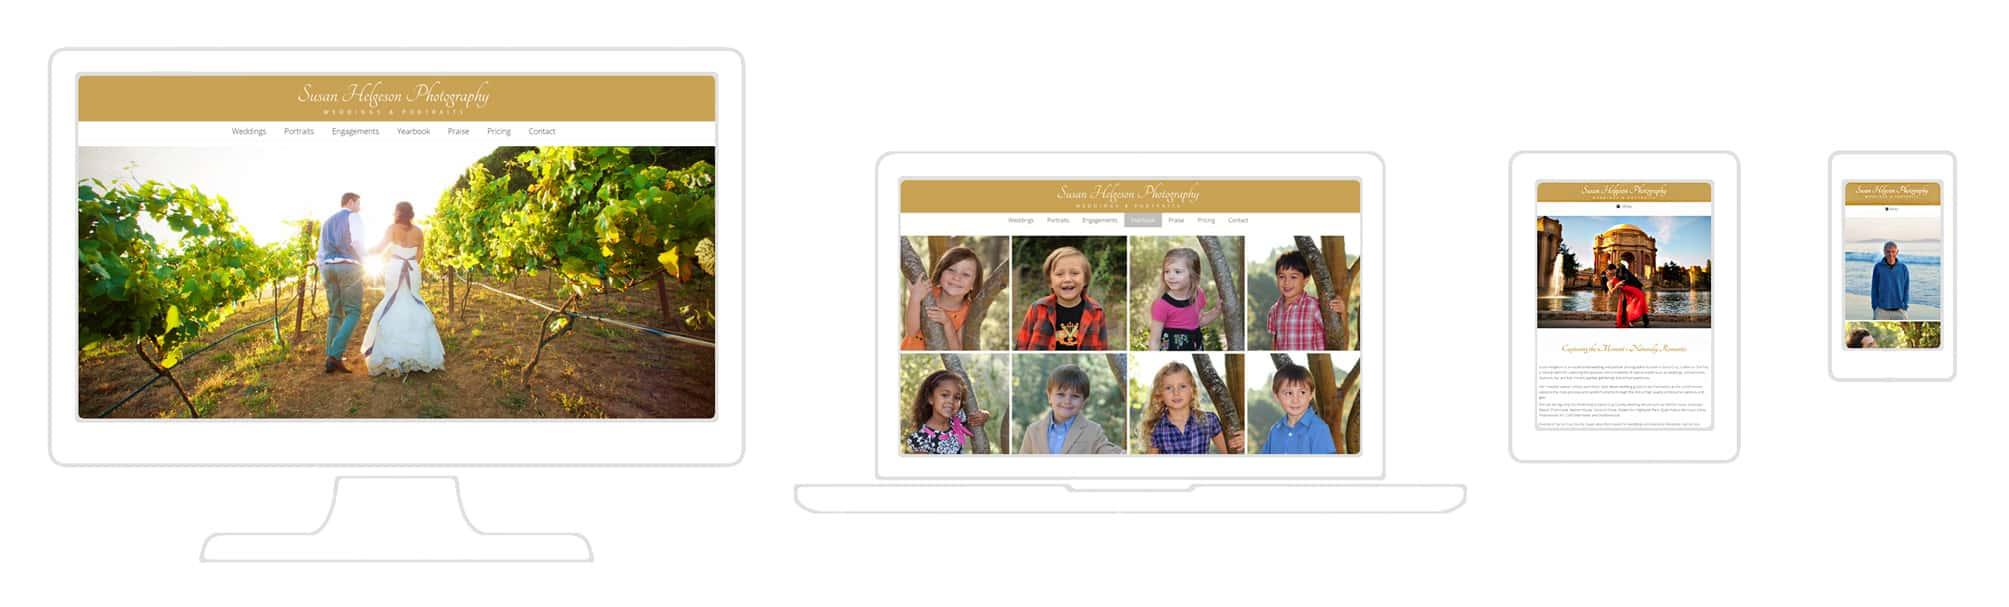 web development, website design and print media design in santa cruz, california